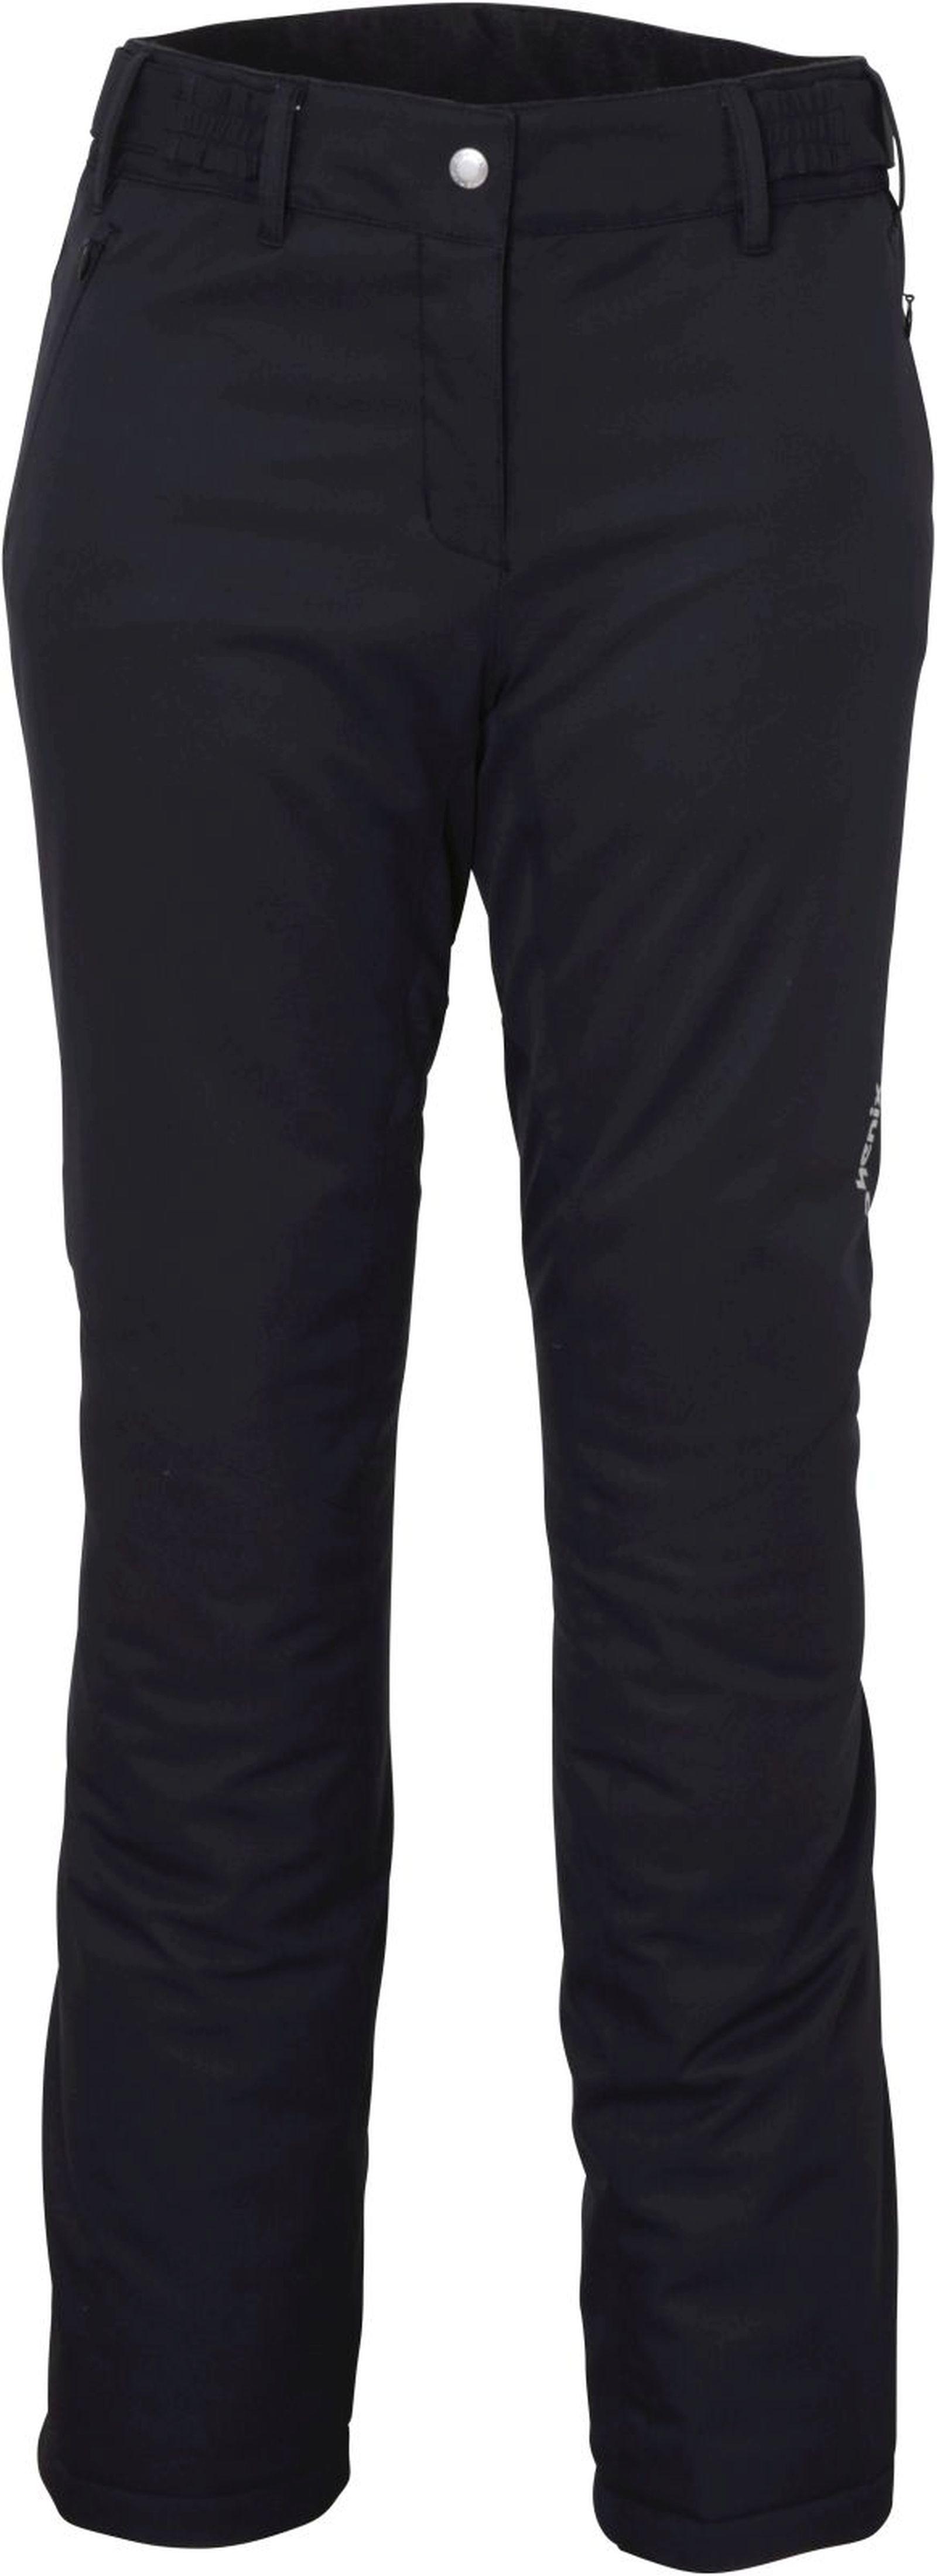 Phenix Lily Slim Pants - black 40